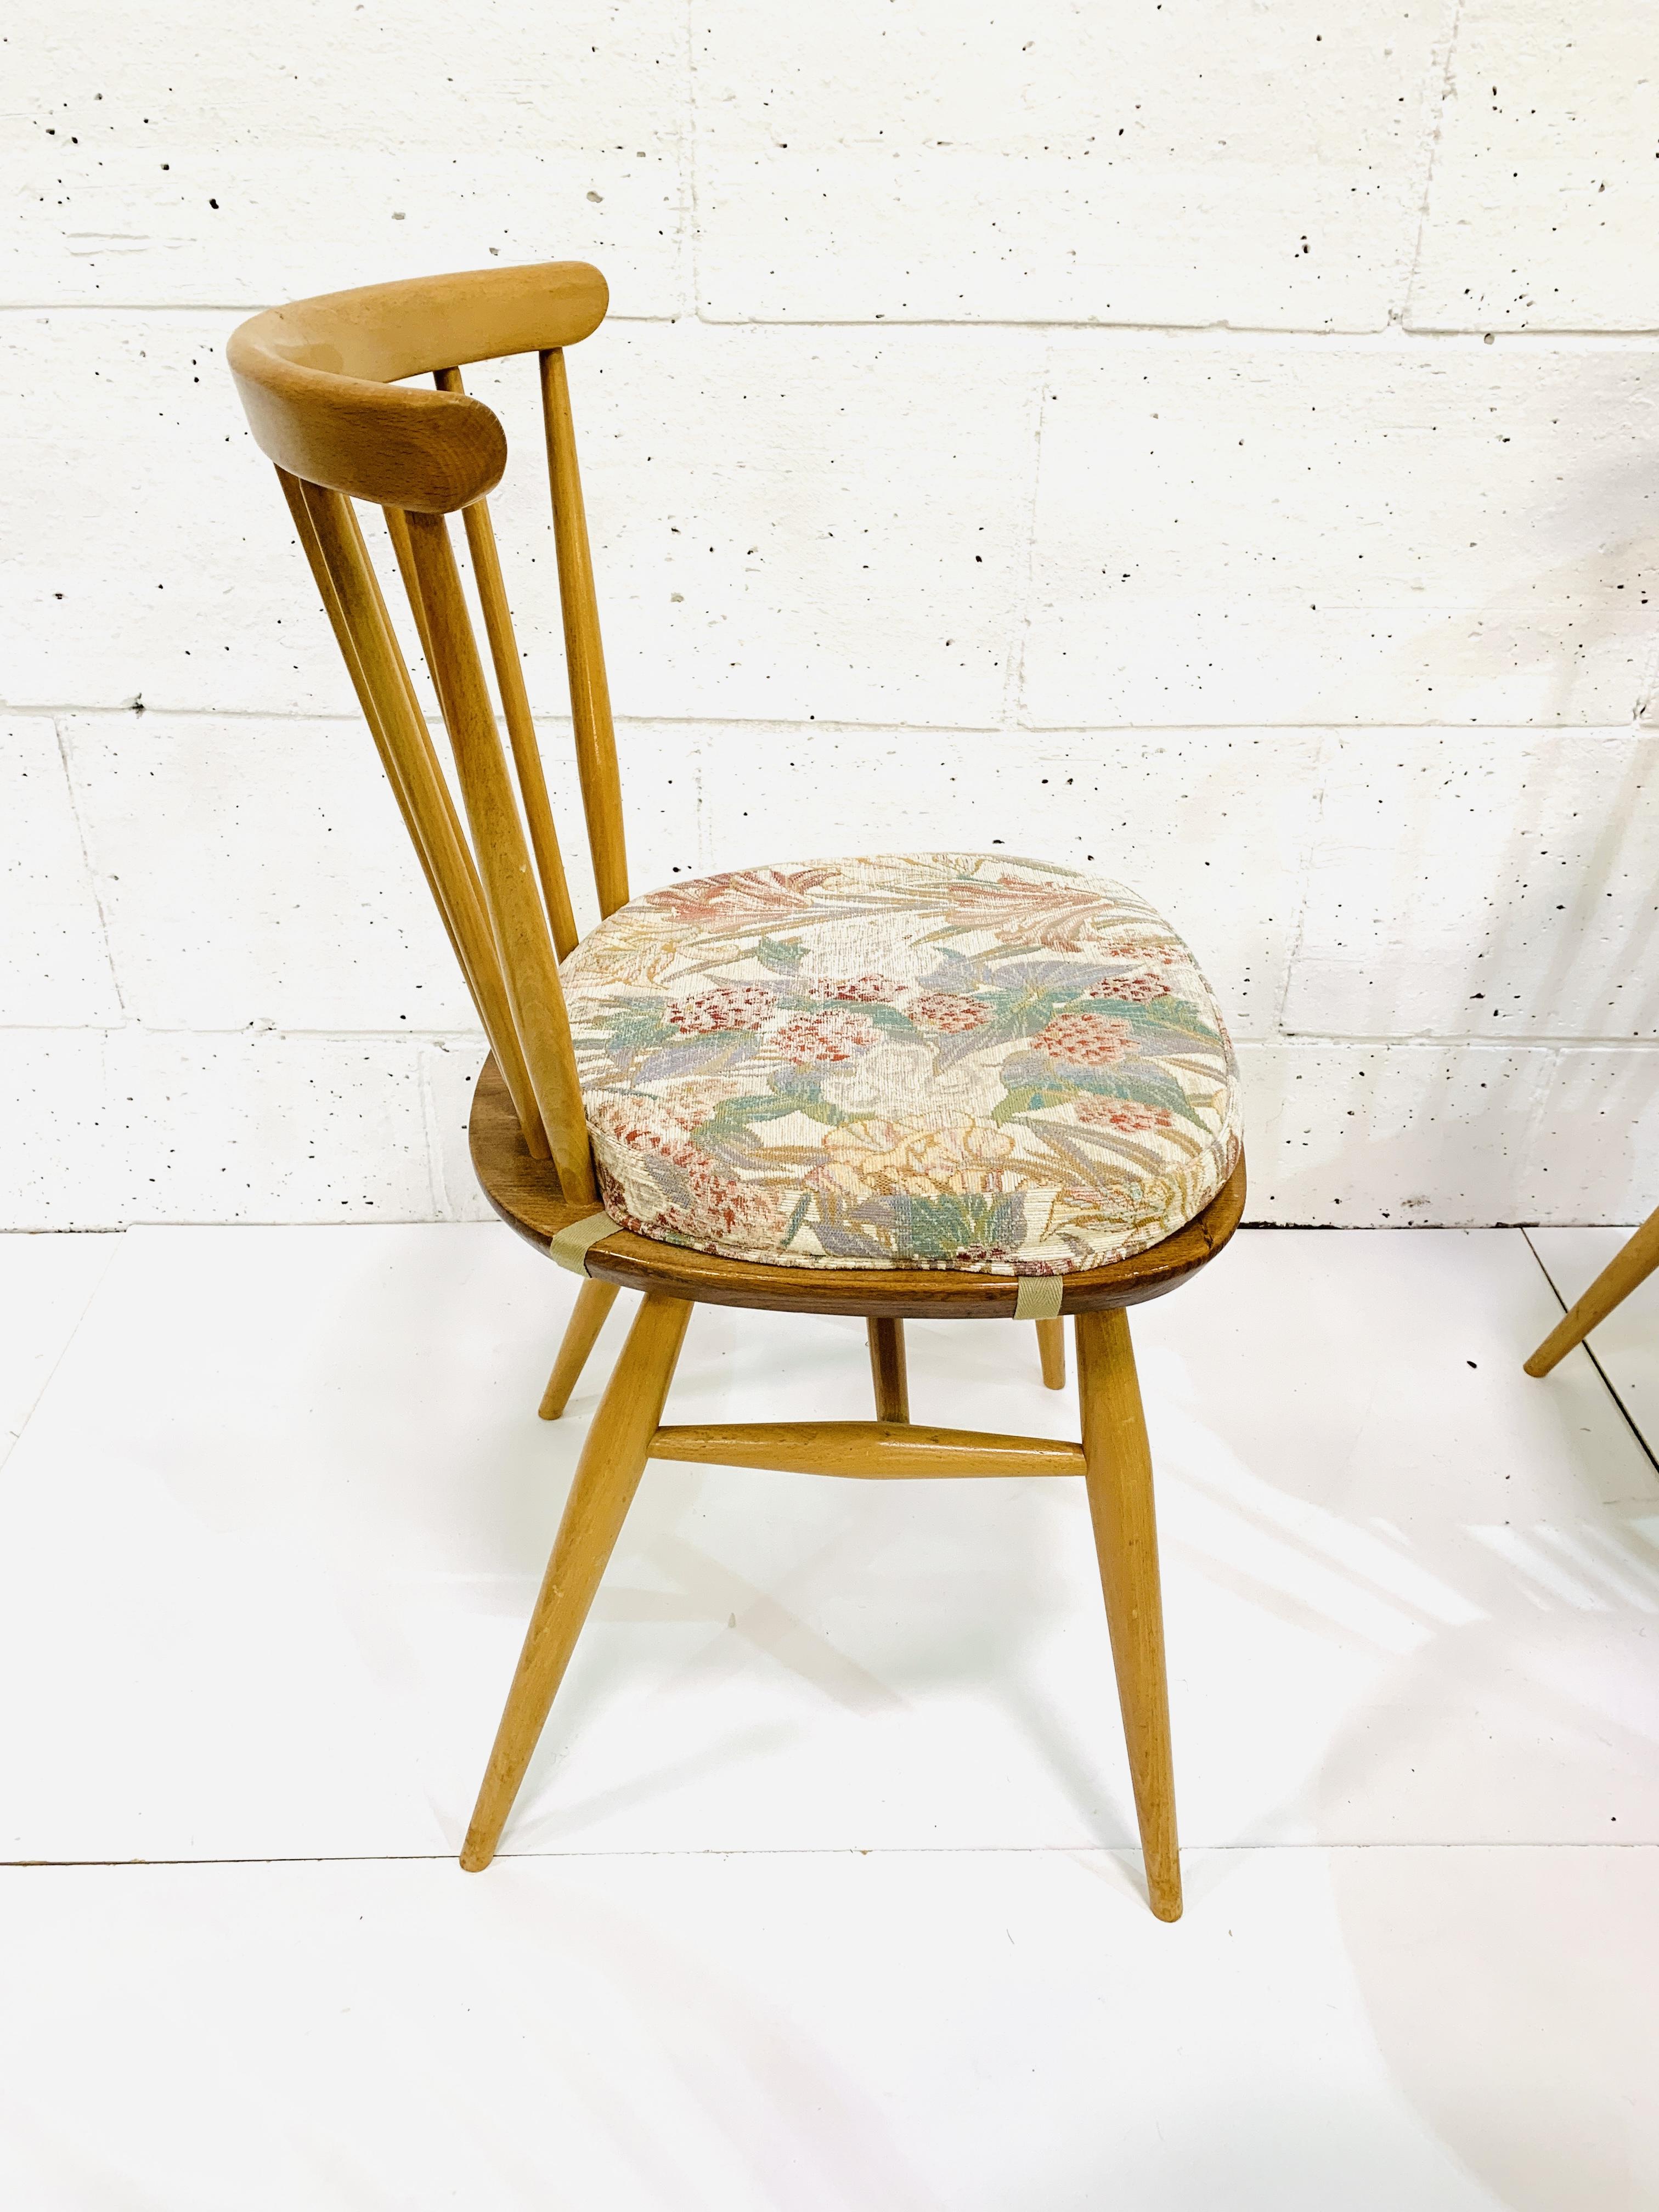 Six Ercol railback chairs - Image 3 of 3